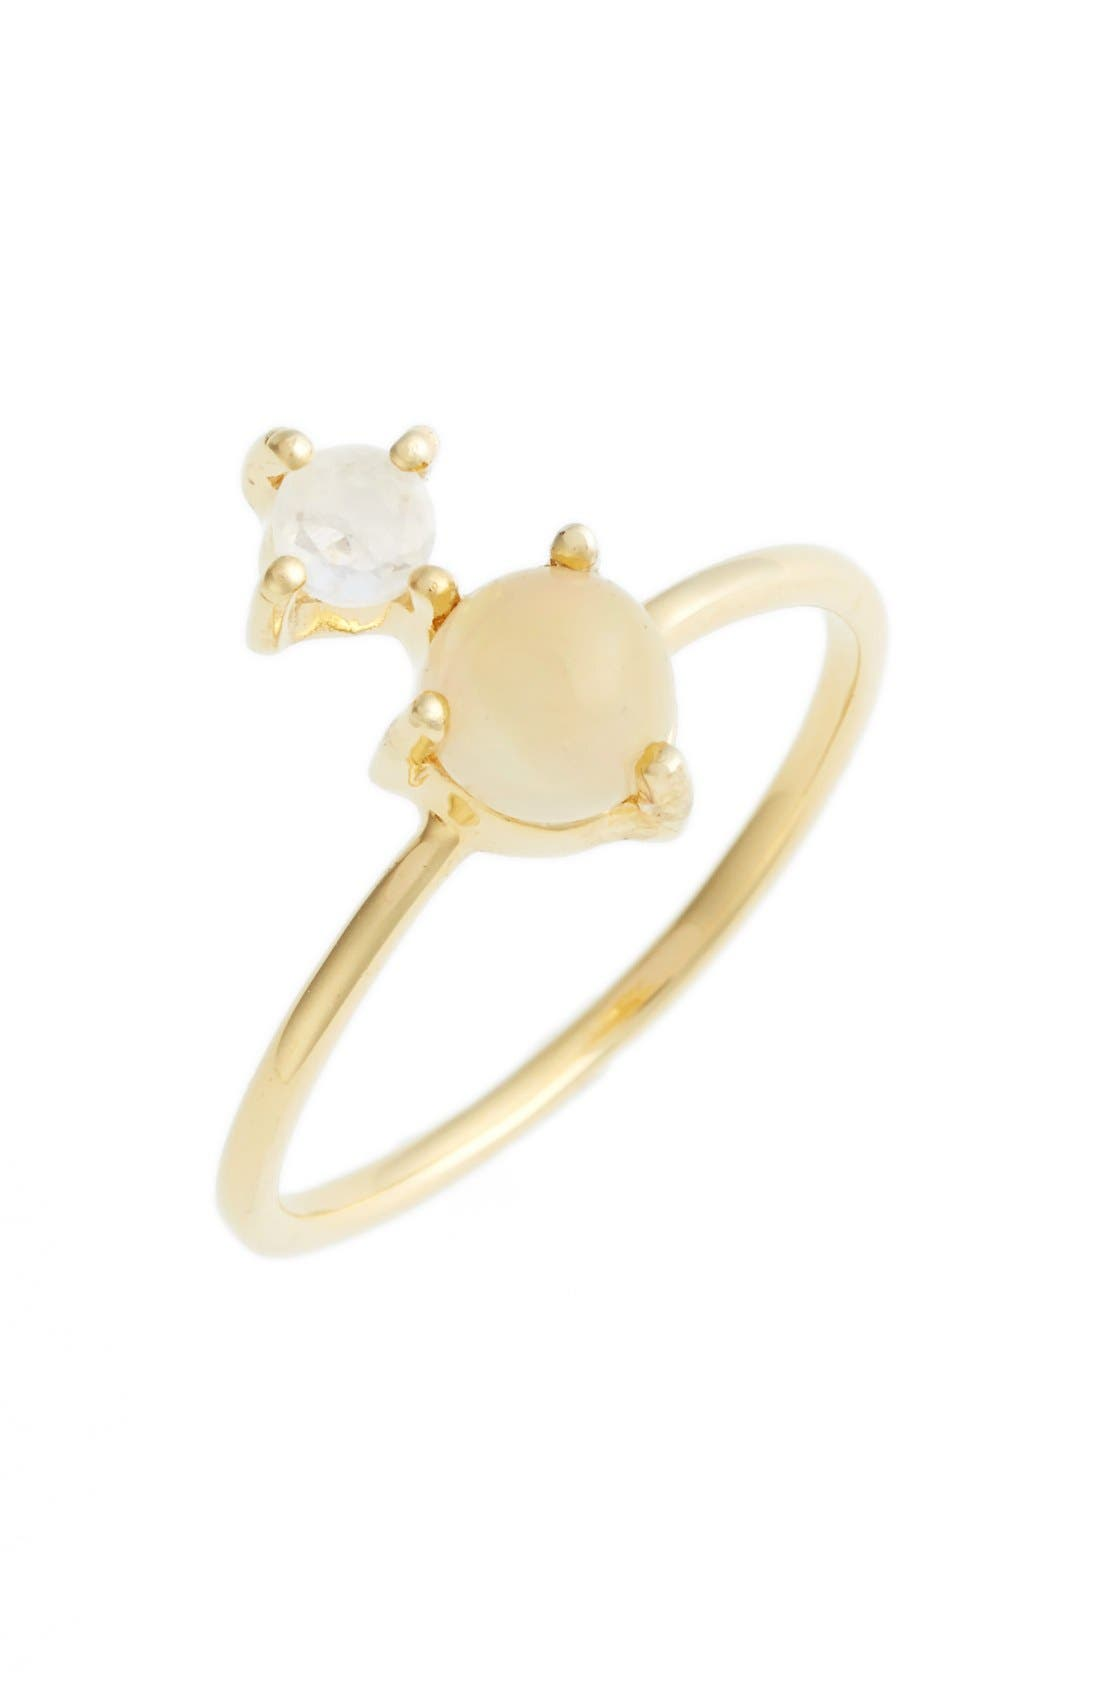 Main Image - Leah Alexandra Opal & Moonstone Ring